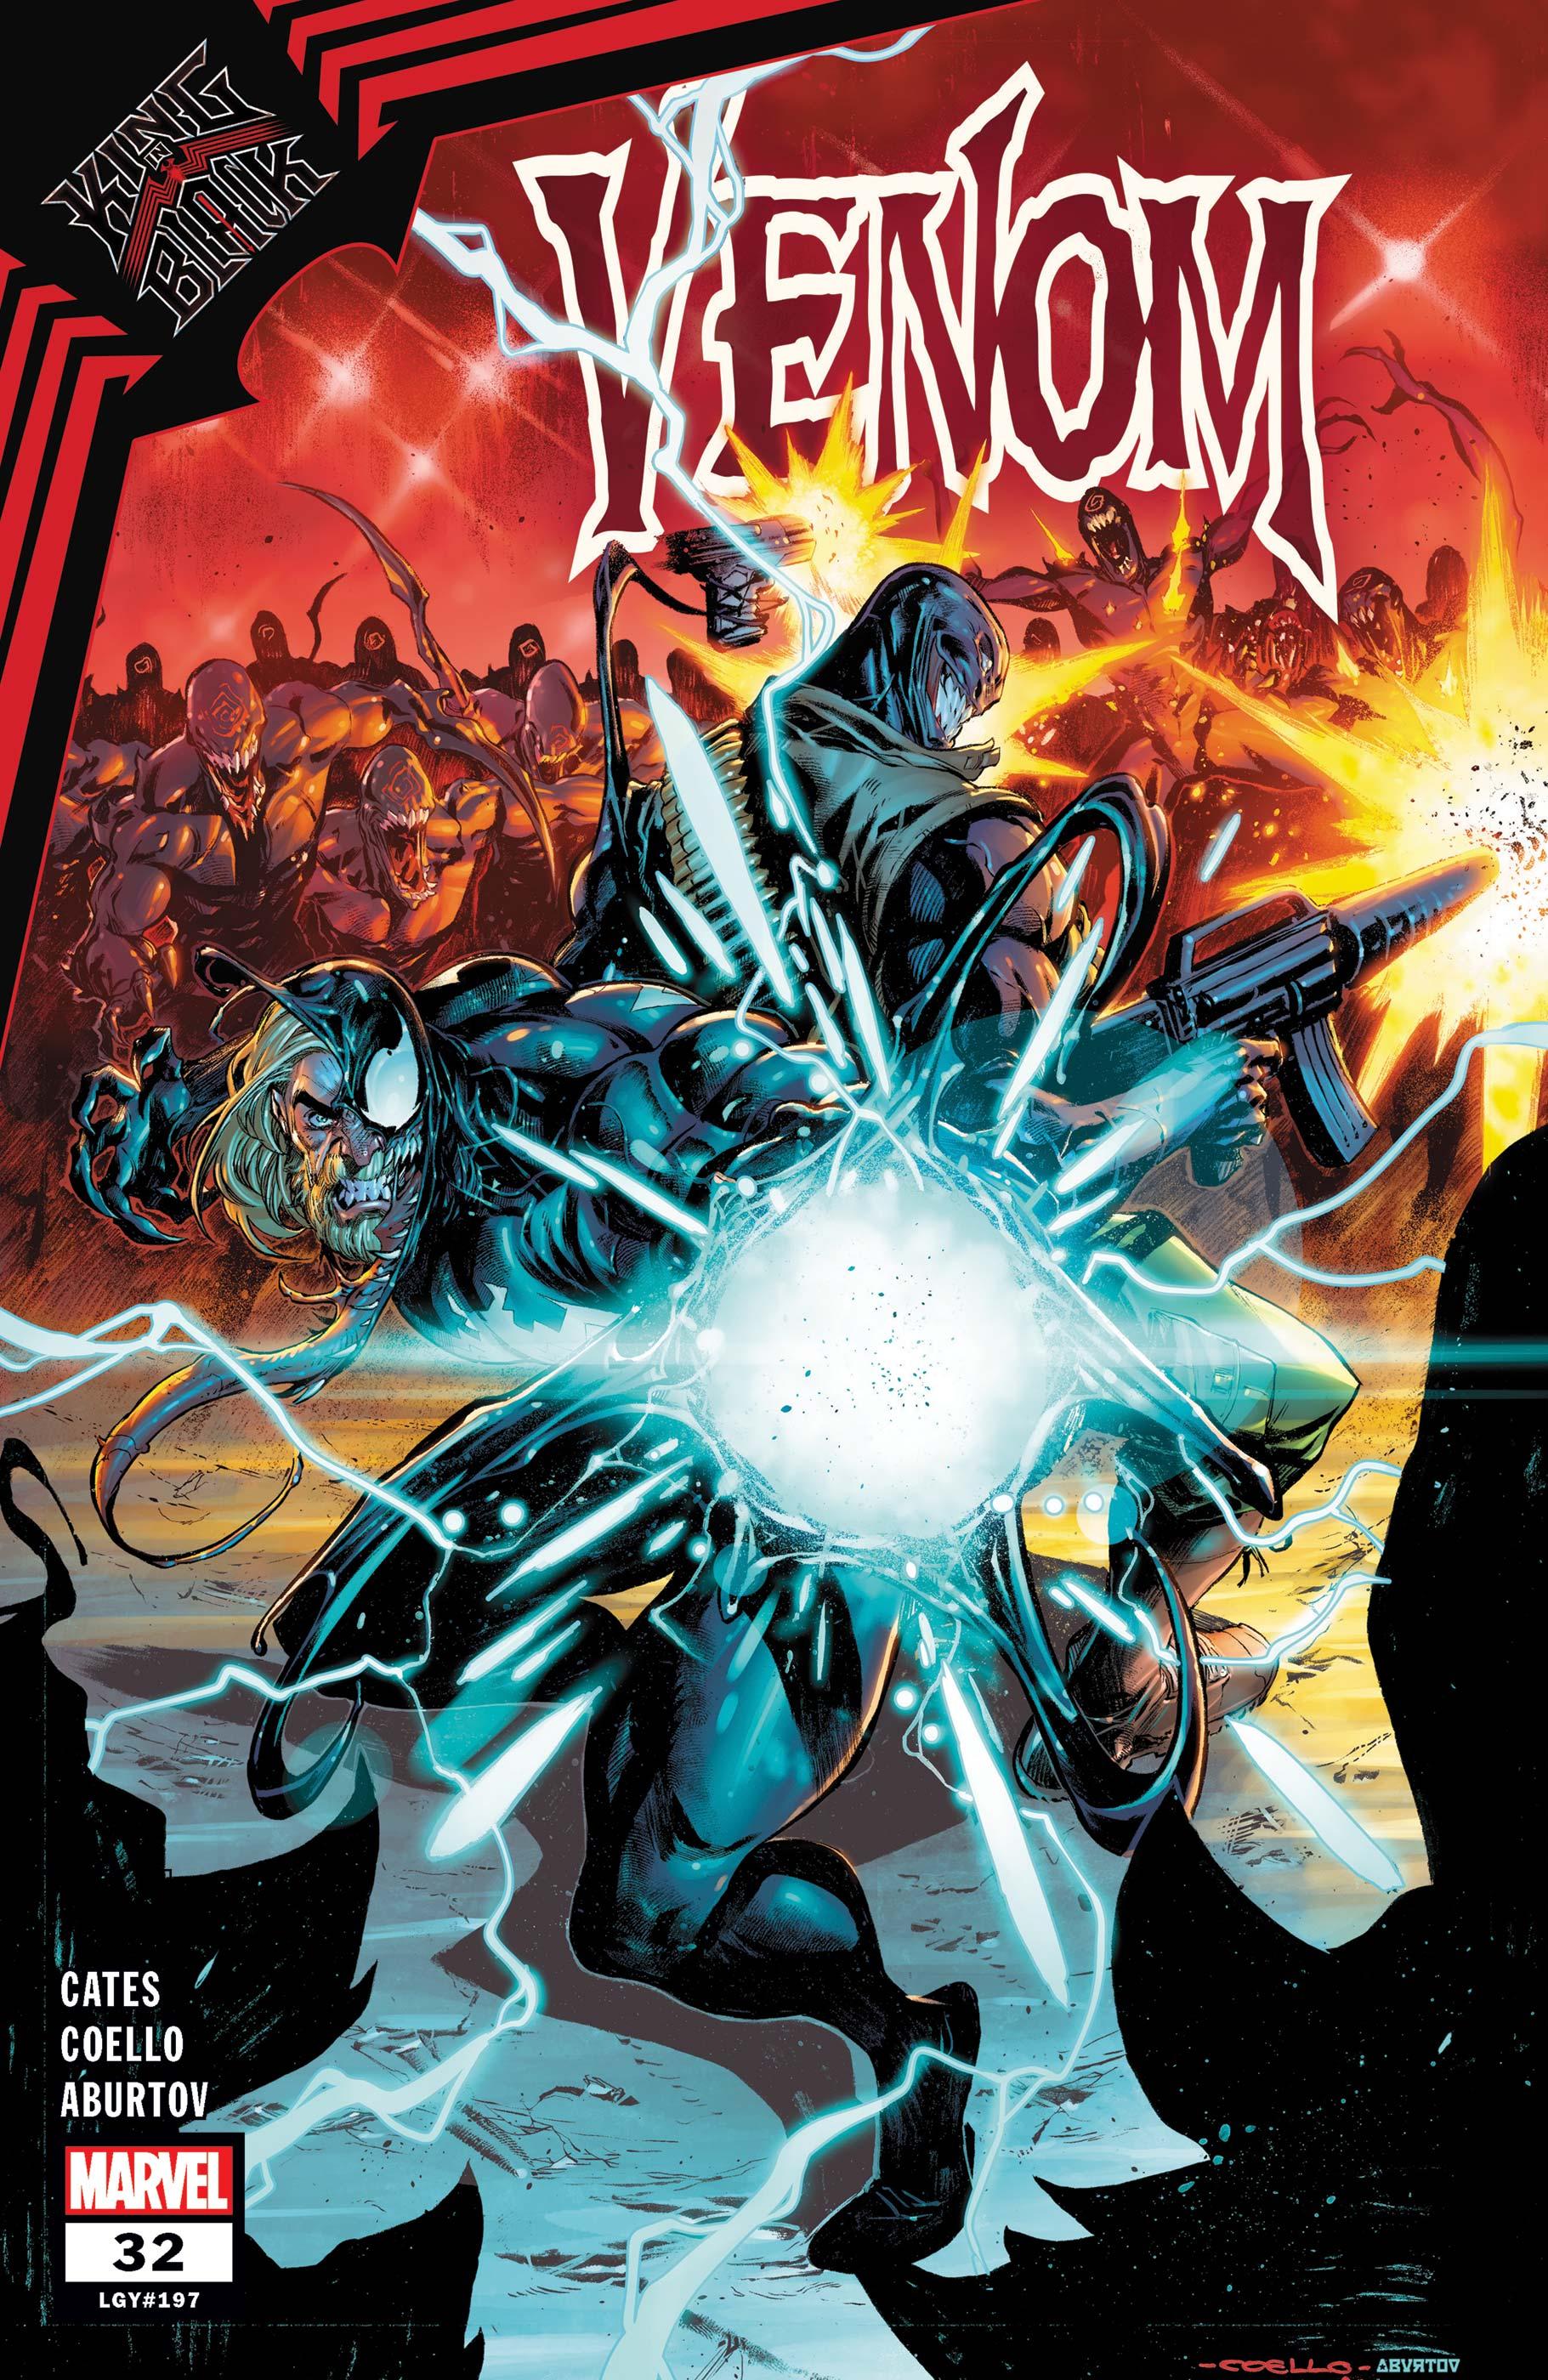 Venom (2018) #32